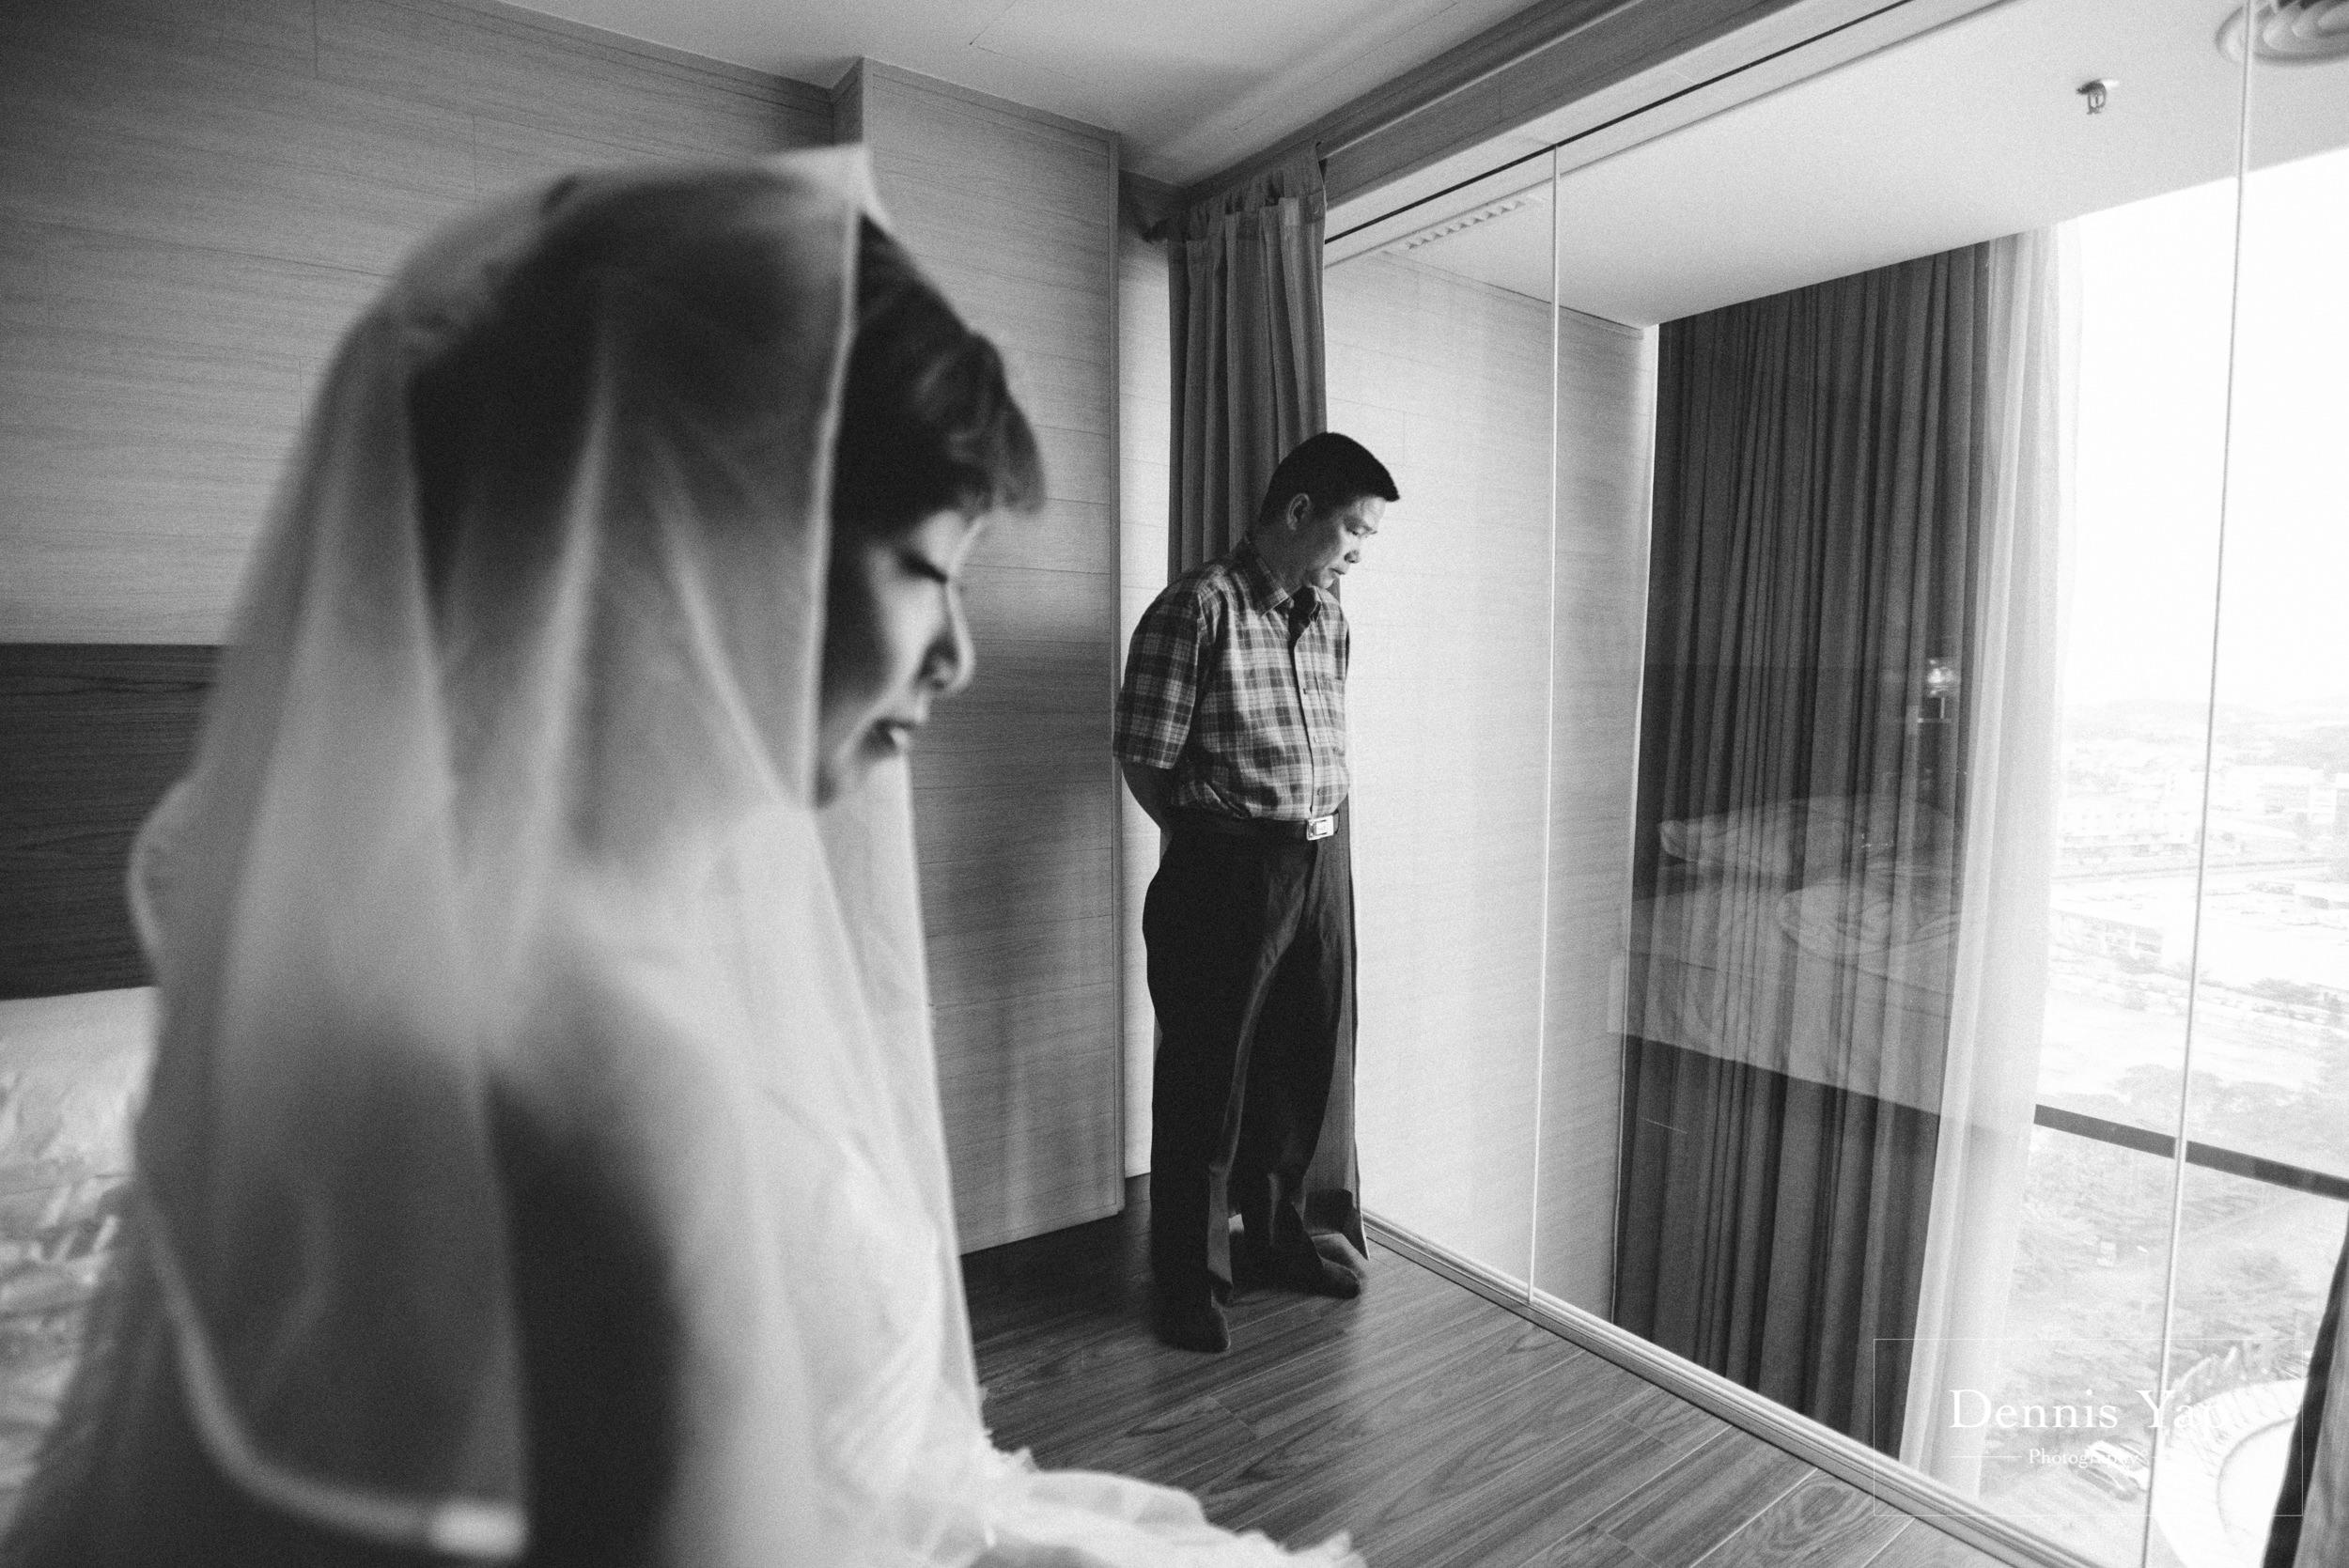 alex eivan wedding day kuala lumpur malaysia dennis yap photography short gown-5.jpg